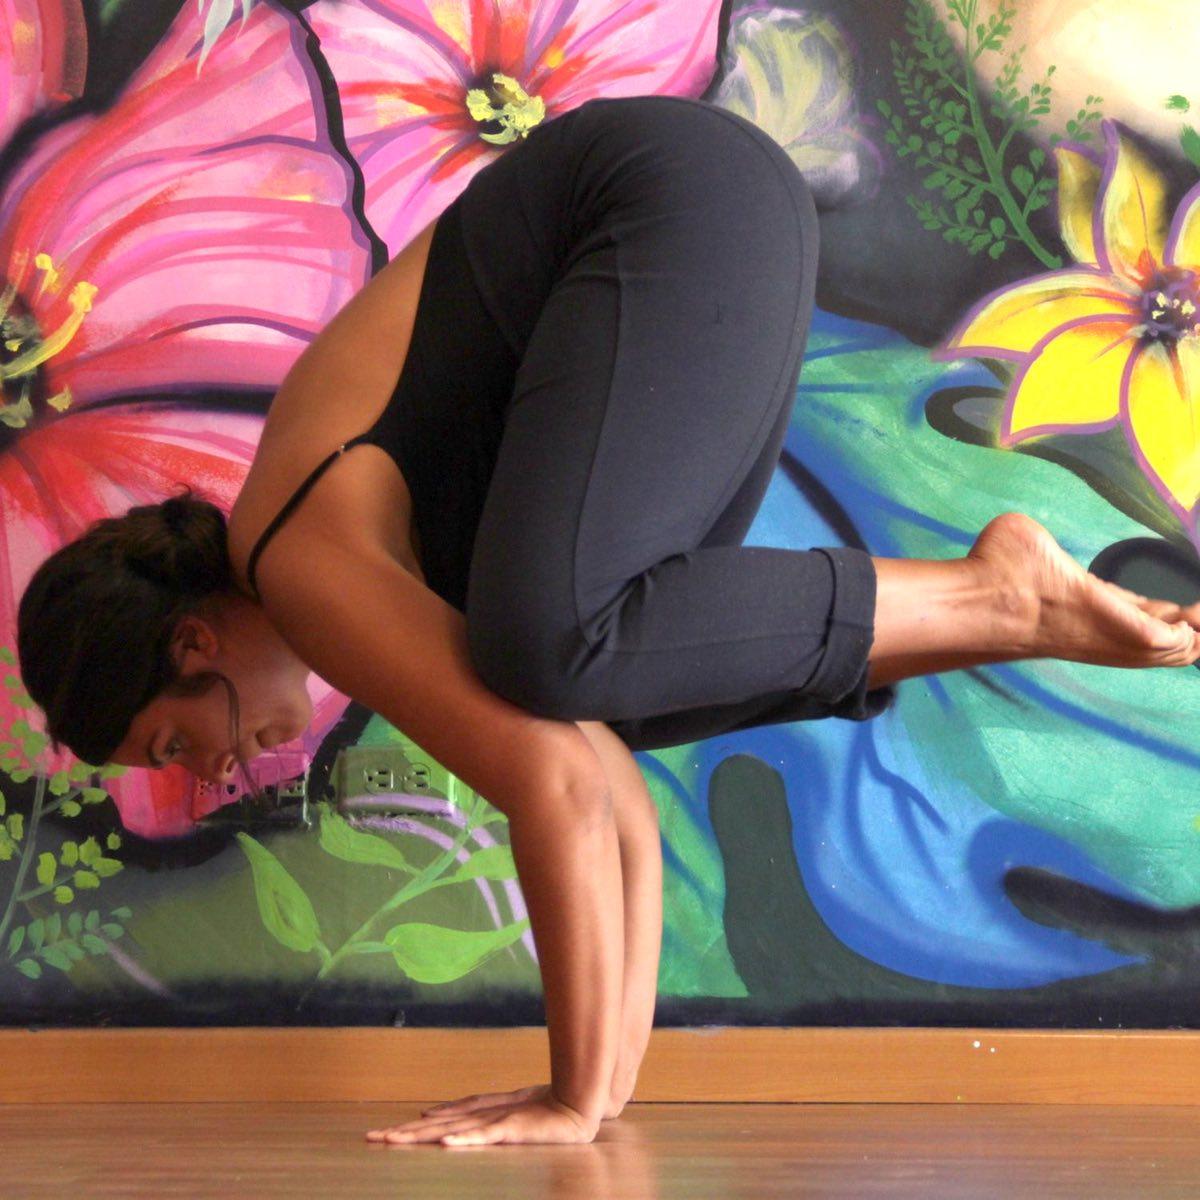 200 hour yoga alliance teacher training Medellin Colombia 4.JPG